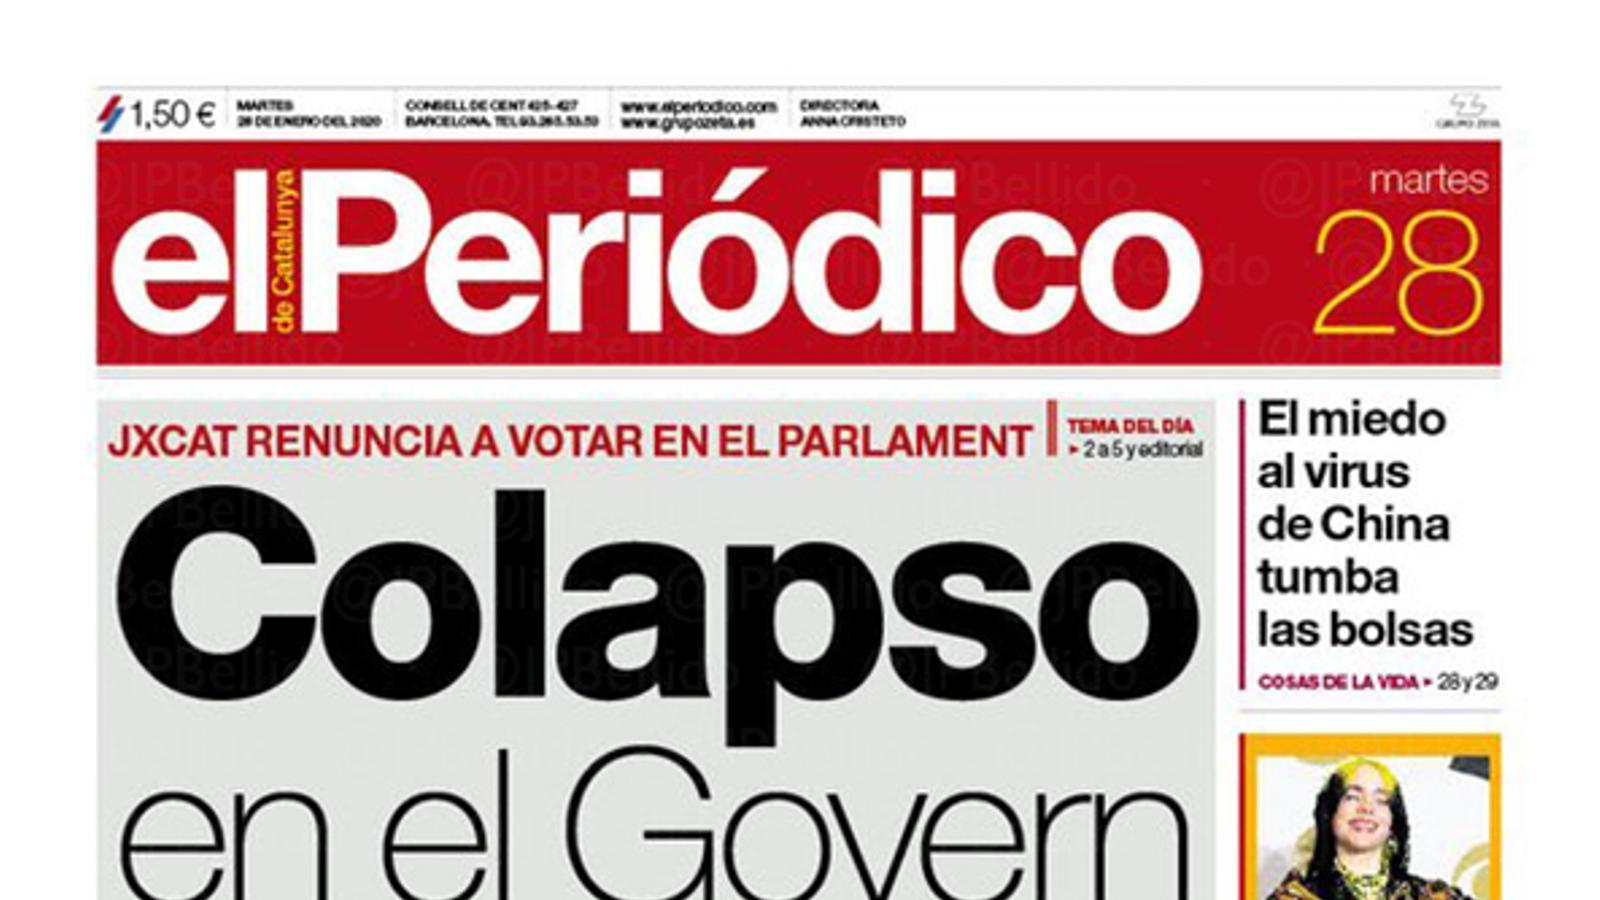 portada periodico 28/01/20